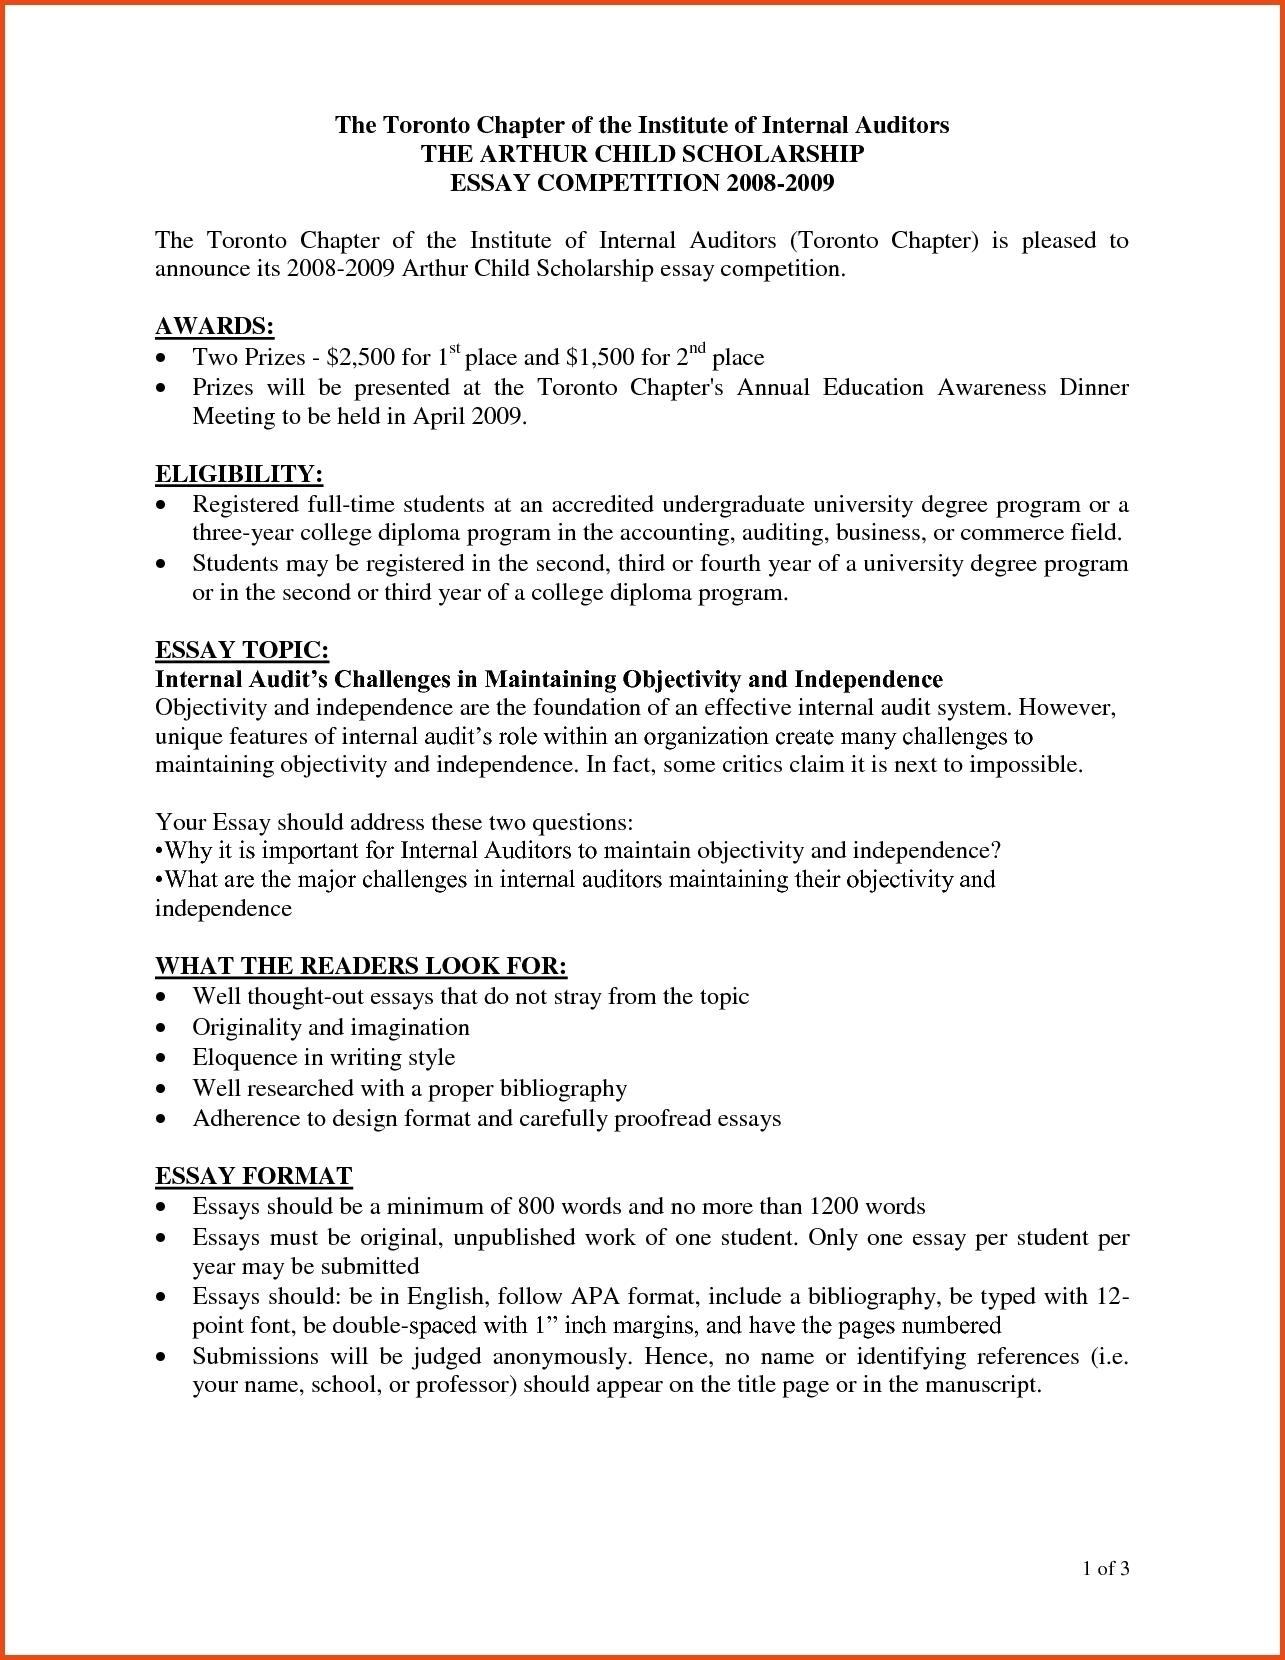 009 College Essay Heading Printables Corner Sample Scholarshipmat Rega Personal Margins Application Papers Entrance Example Proper